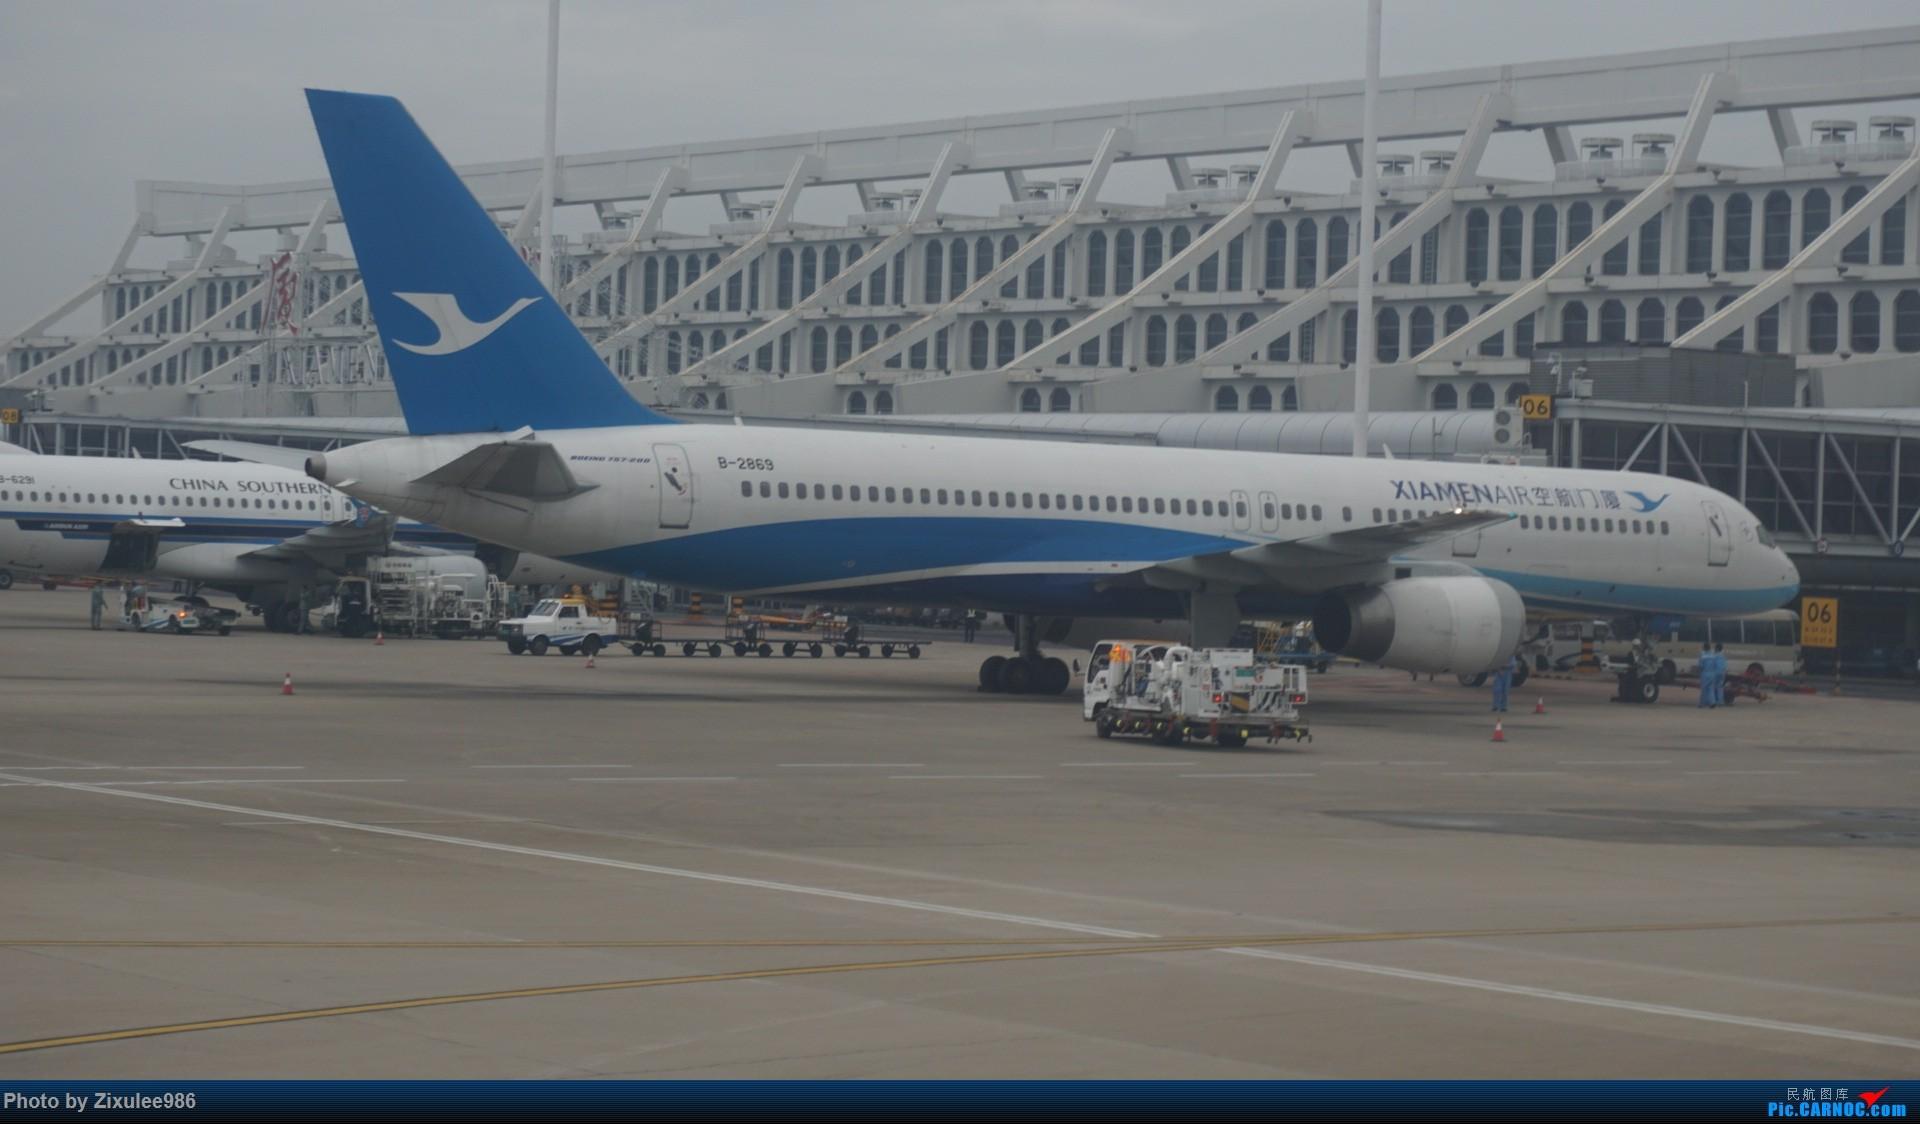 Re:[原创][XMN]寒假东北游随拍PART1--厦航篇~头一次拍752 BOEING 757-200 B-2869 中国厦门高崎国际机场